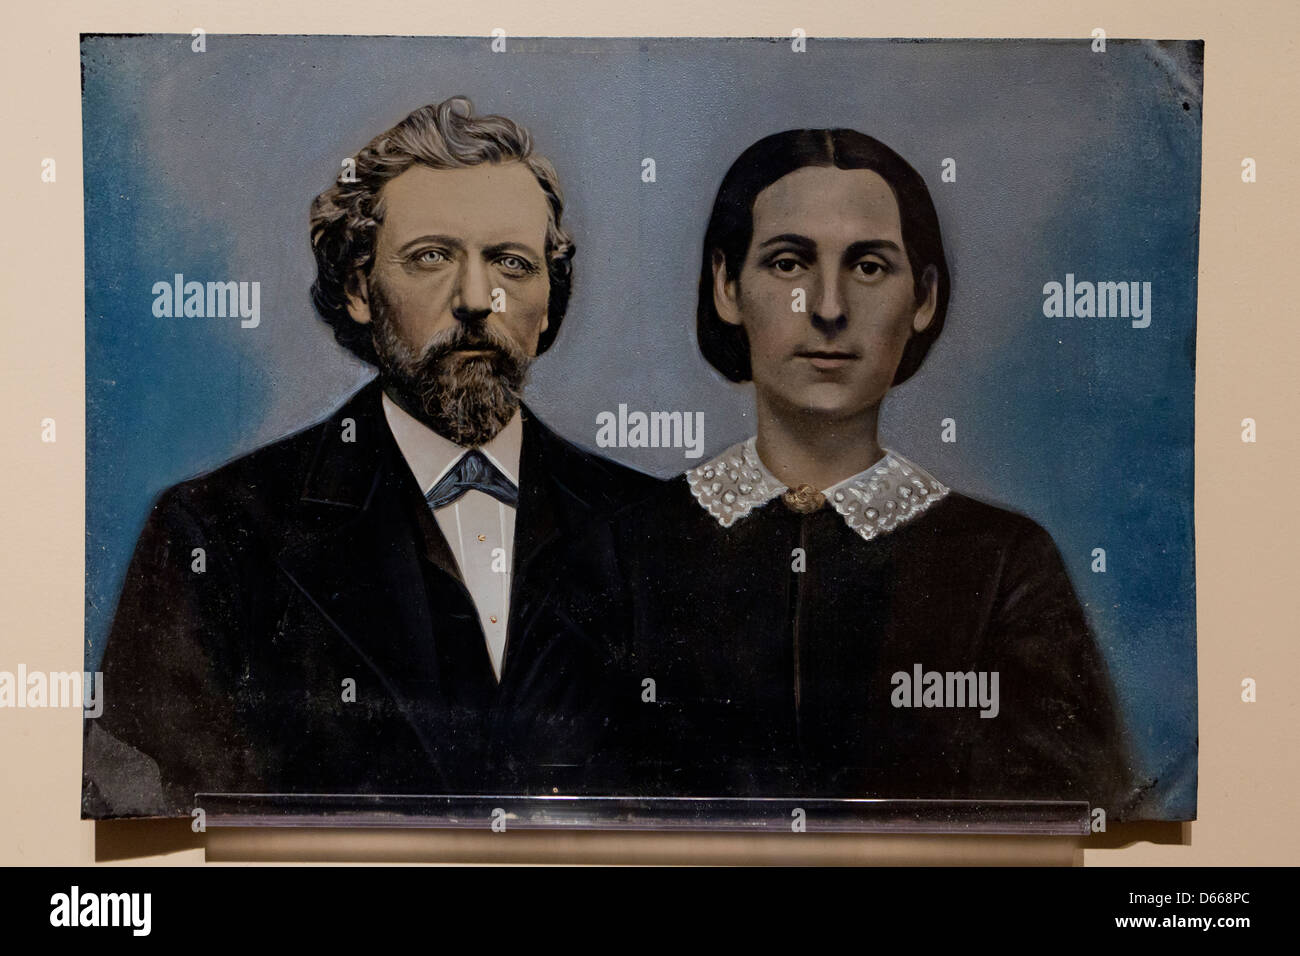 1800s tintype photograph - Stock Image